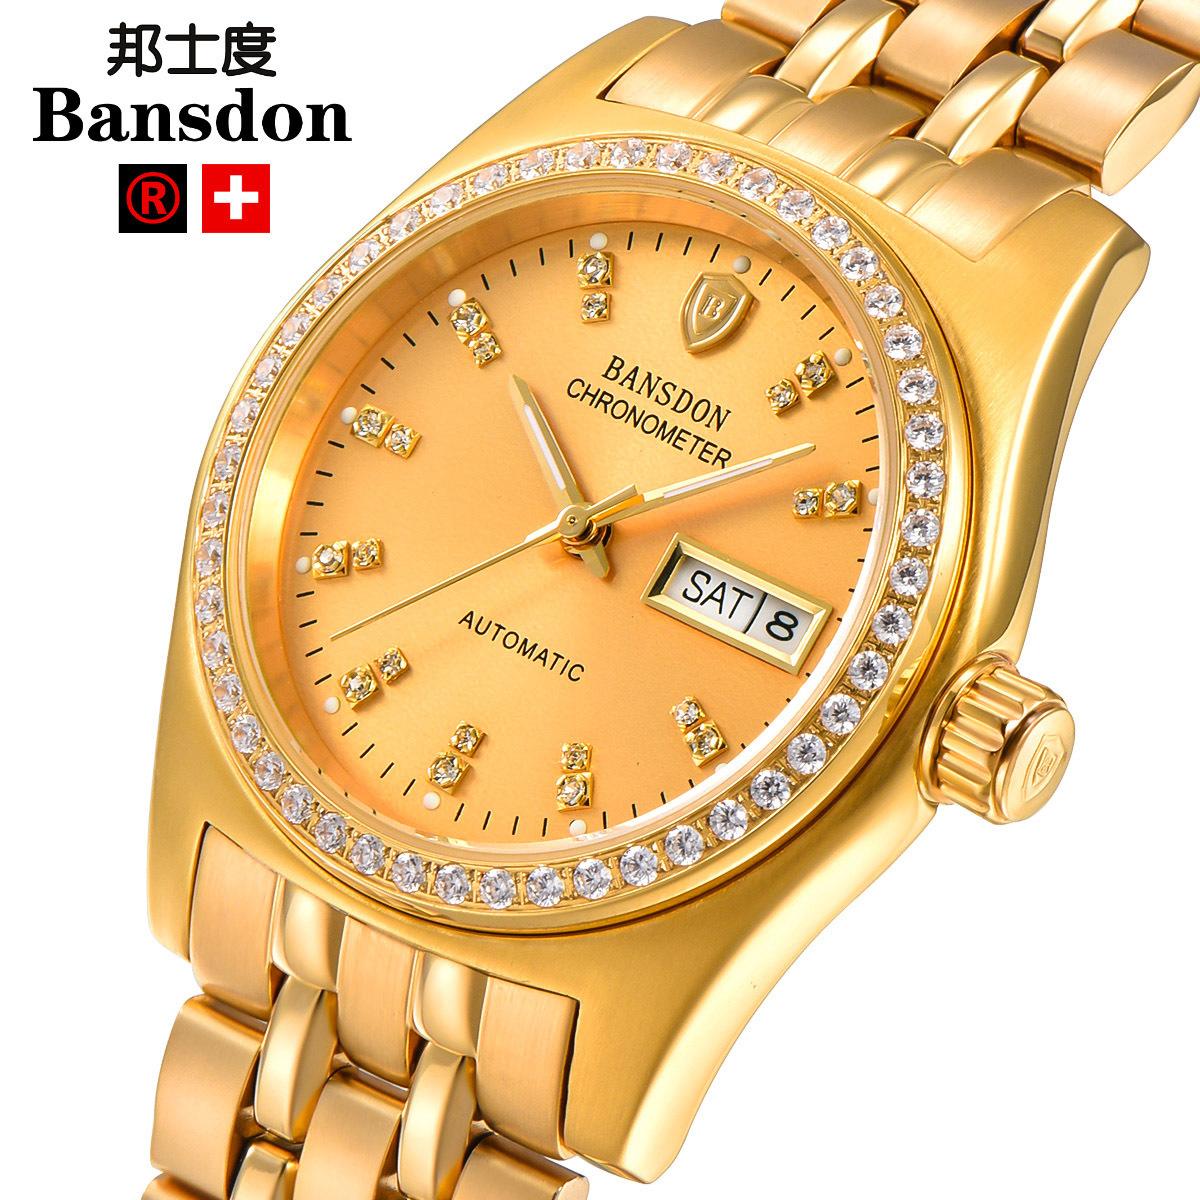 Authentic bonshidu gold watch mens watch double calendar automatic mechanical watch waterproof hollow gold watch mens Watch